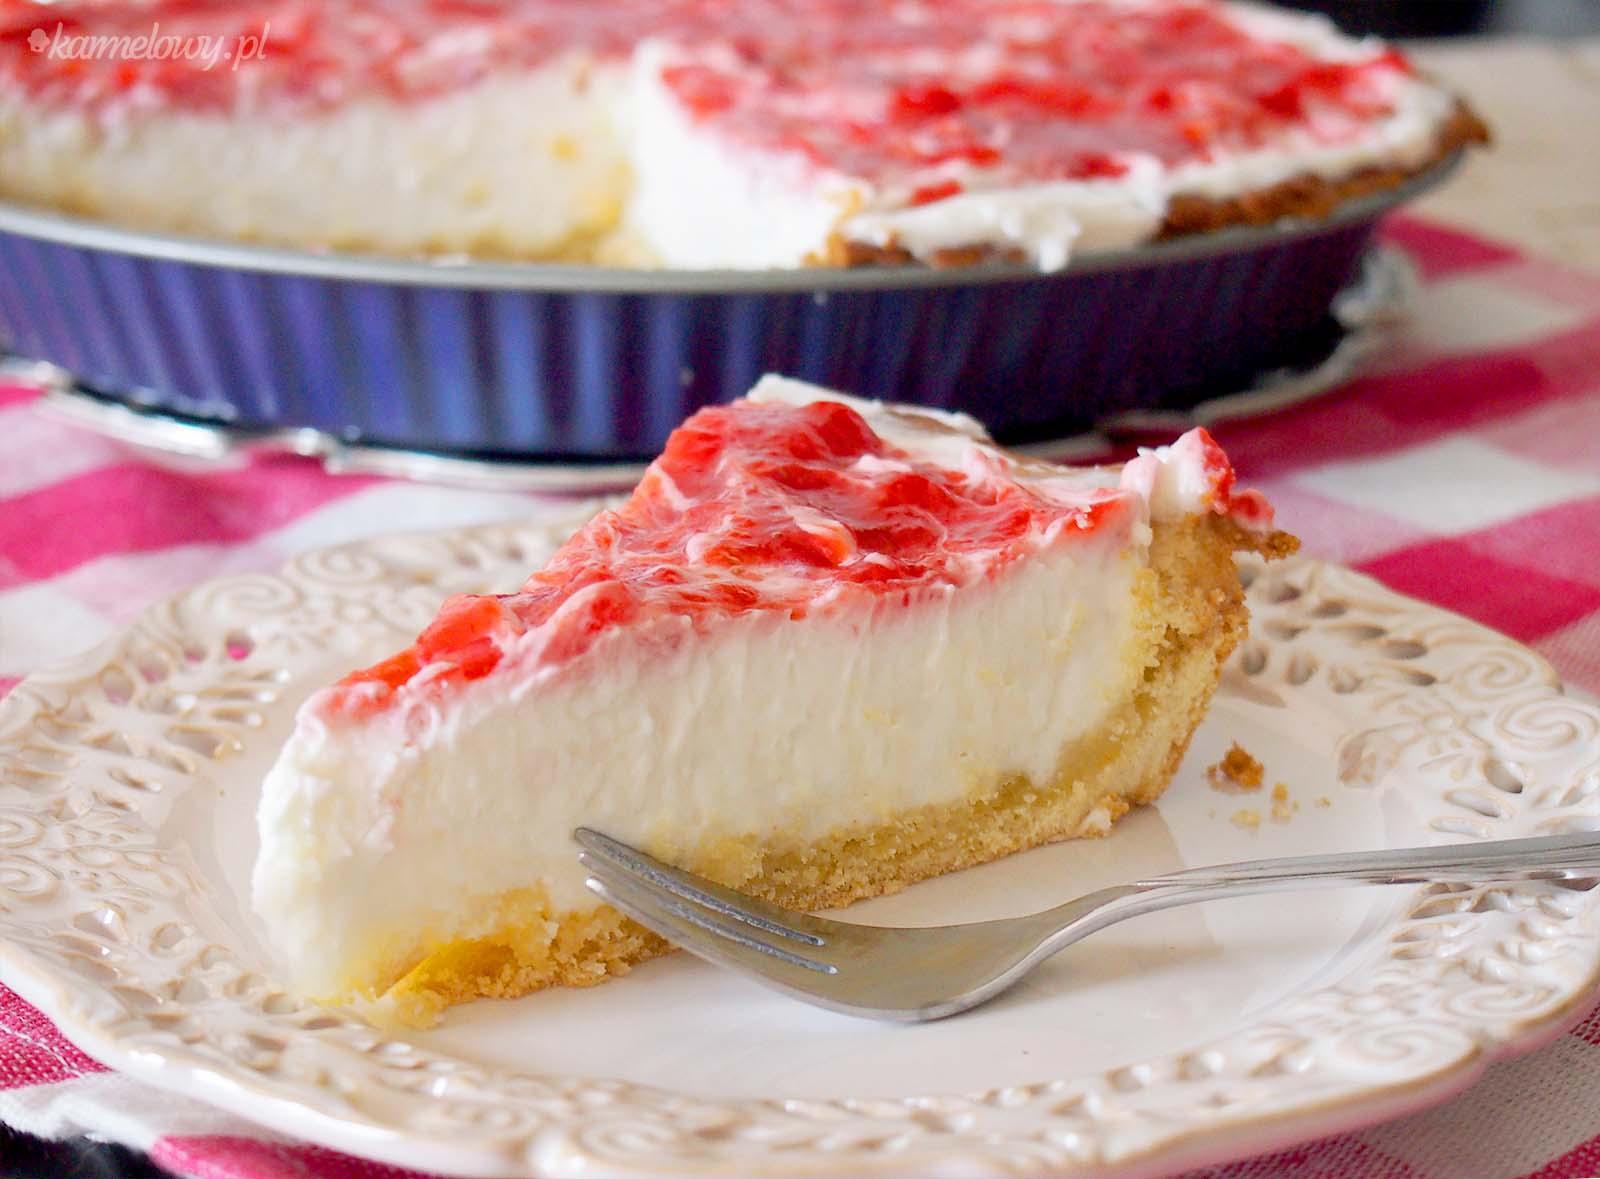 ... truskawkami / Strawberry cream cheese tart - Karmelowy blog kulinarny